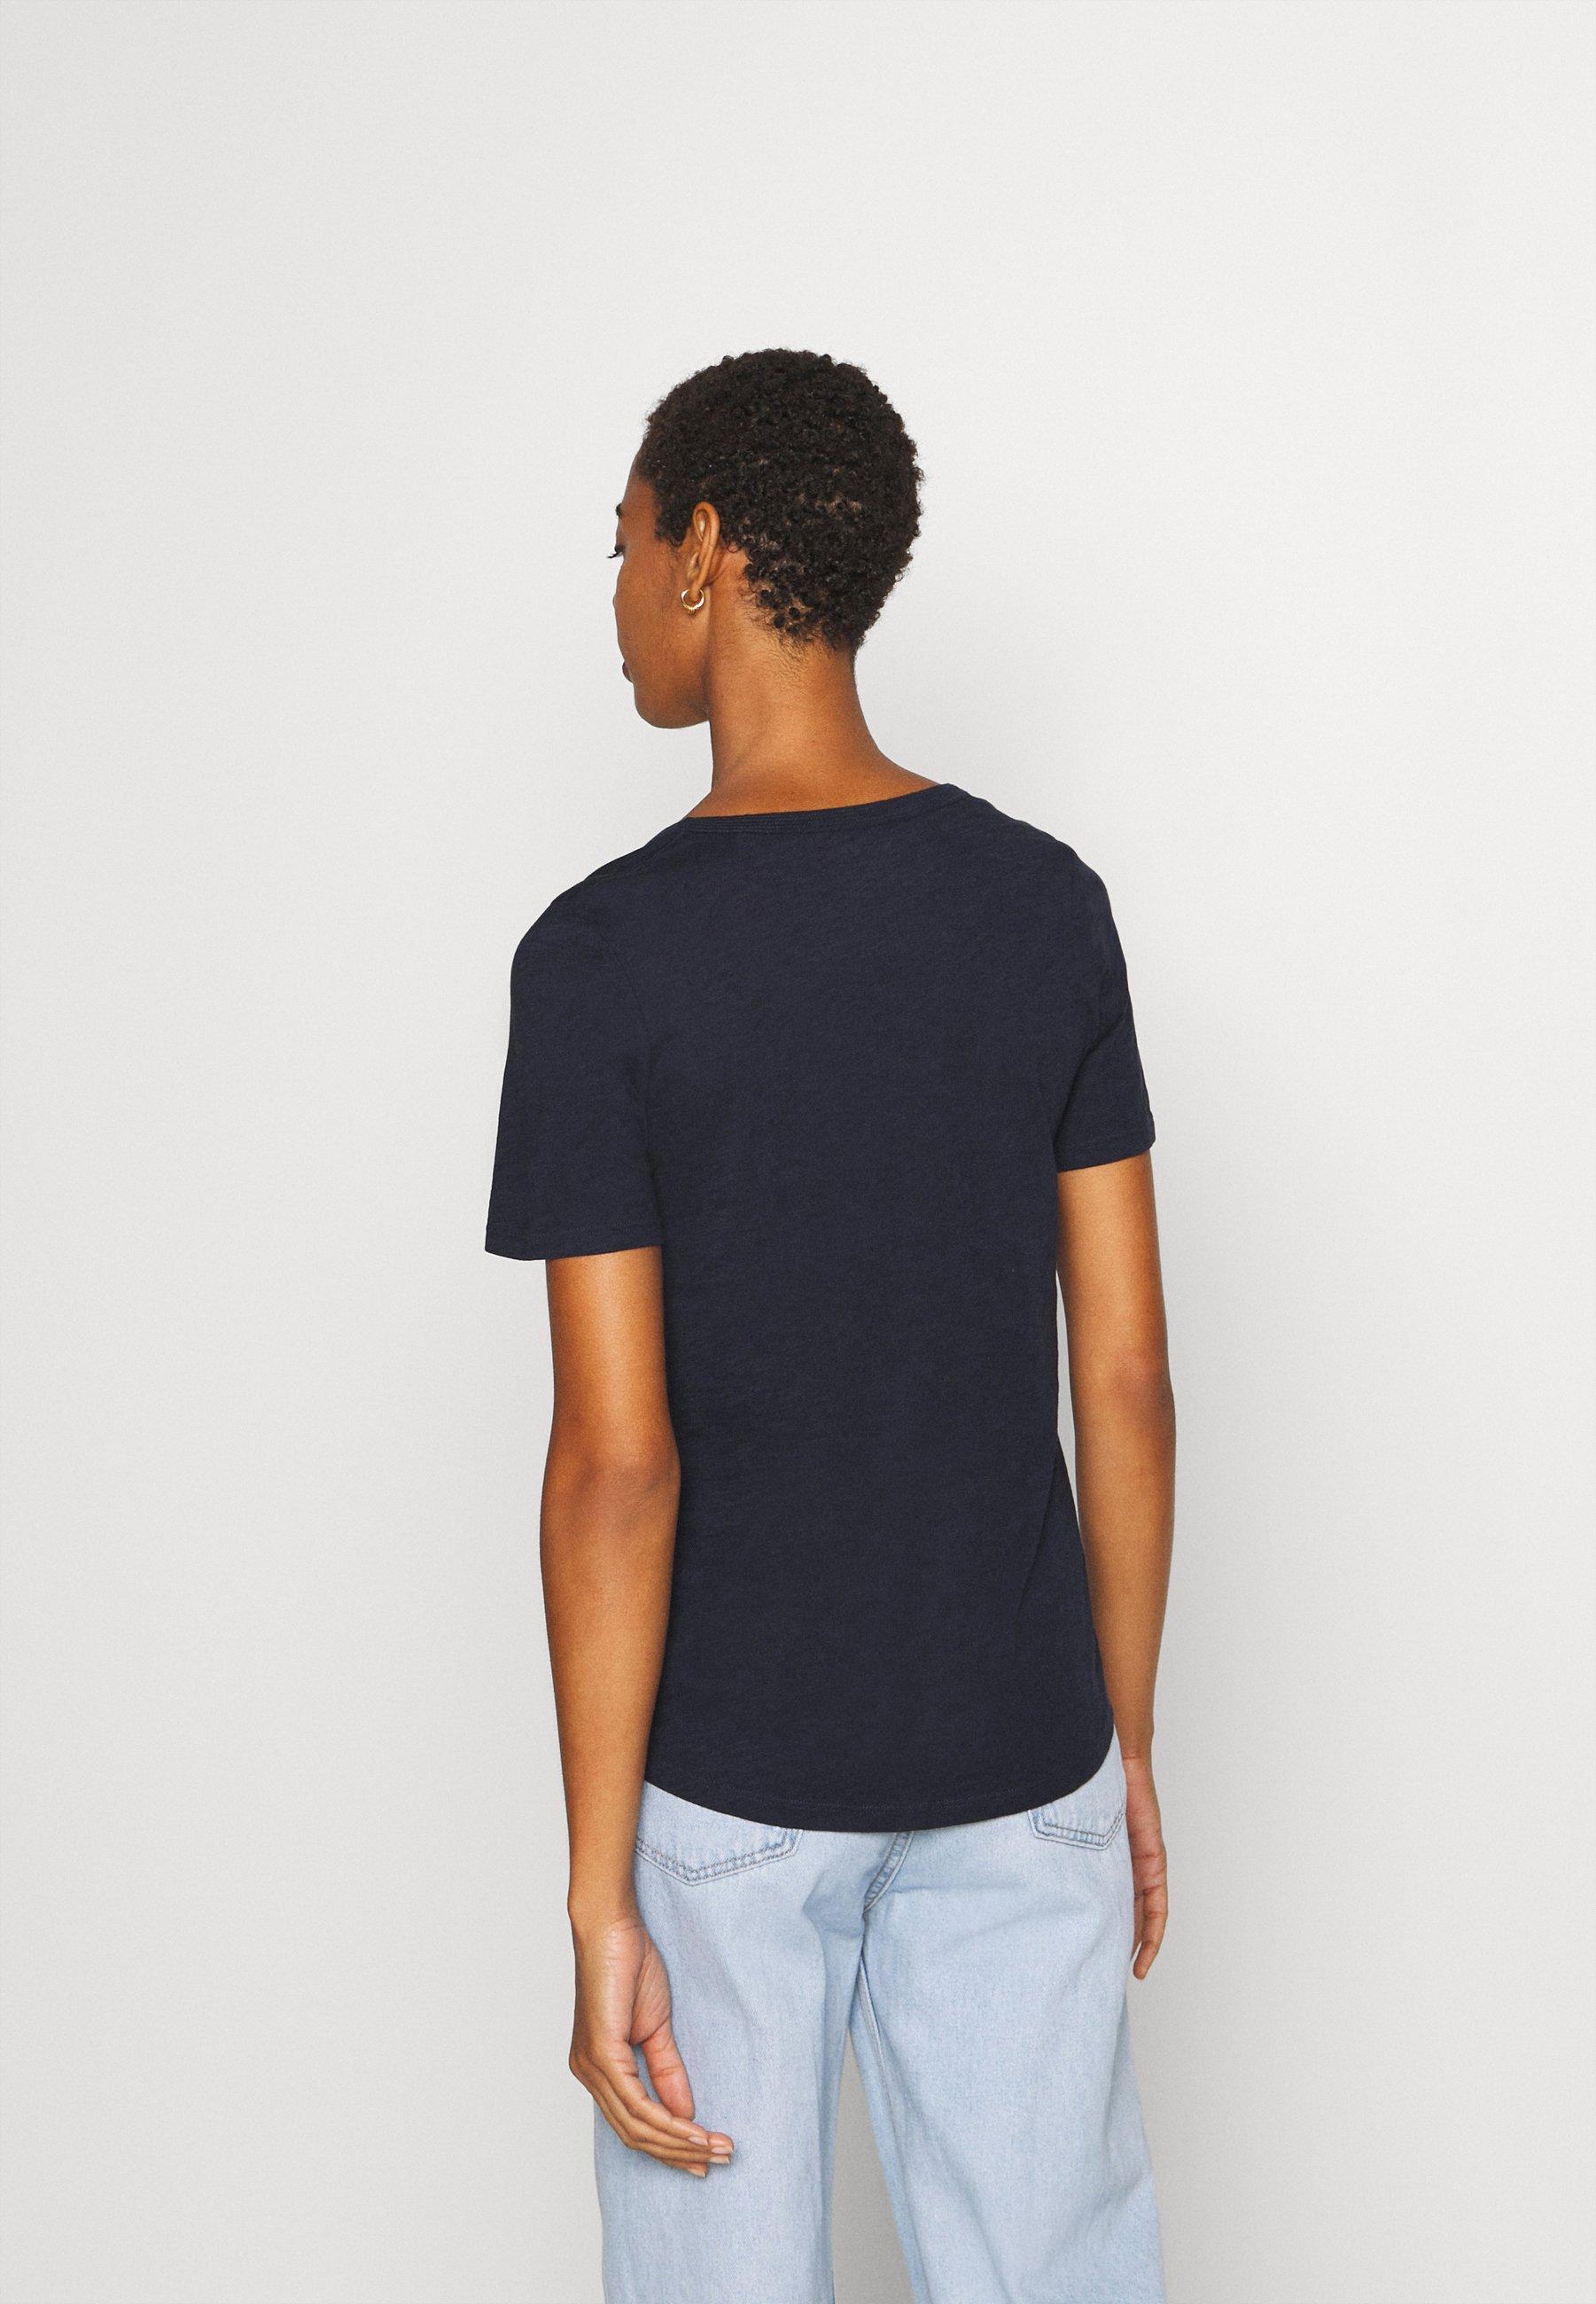 Marc O'polo Short Sleeve - T-shirts Night Sky/mørkeblå